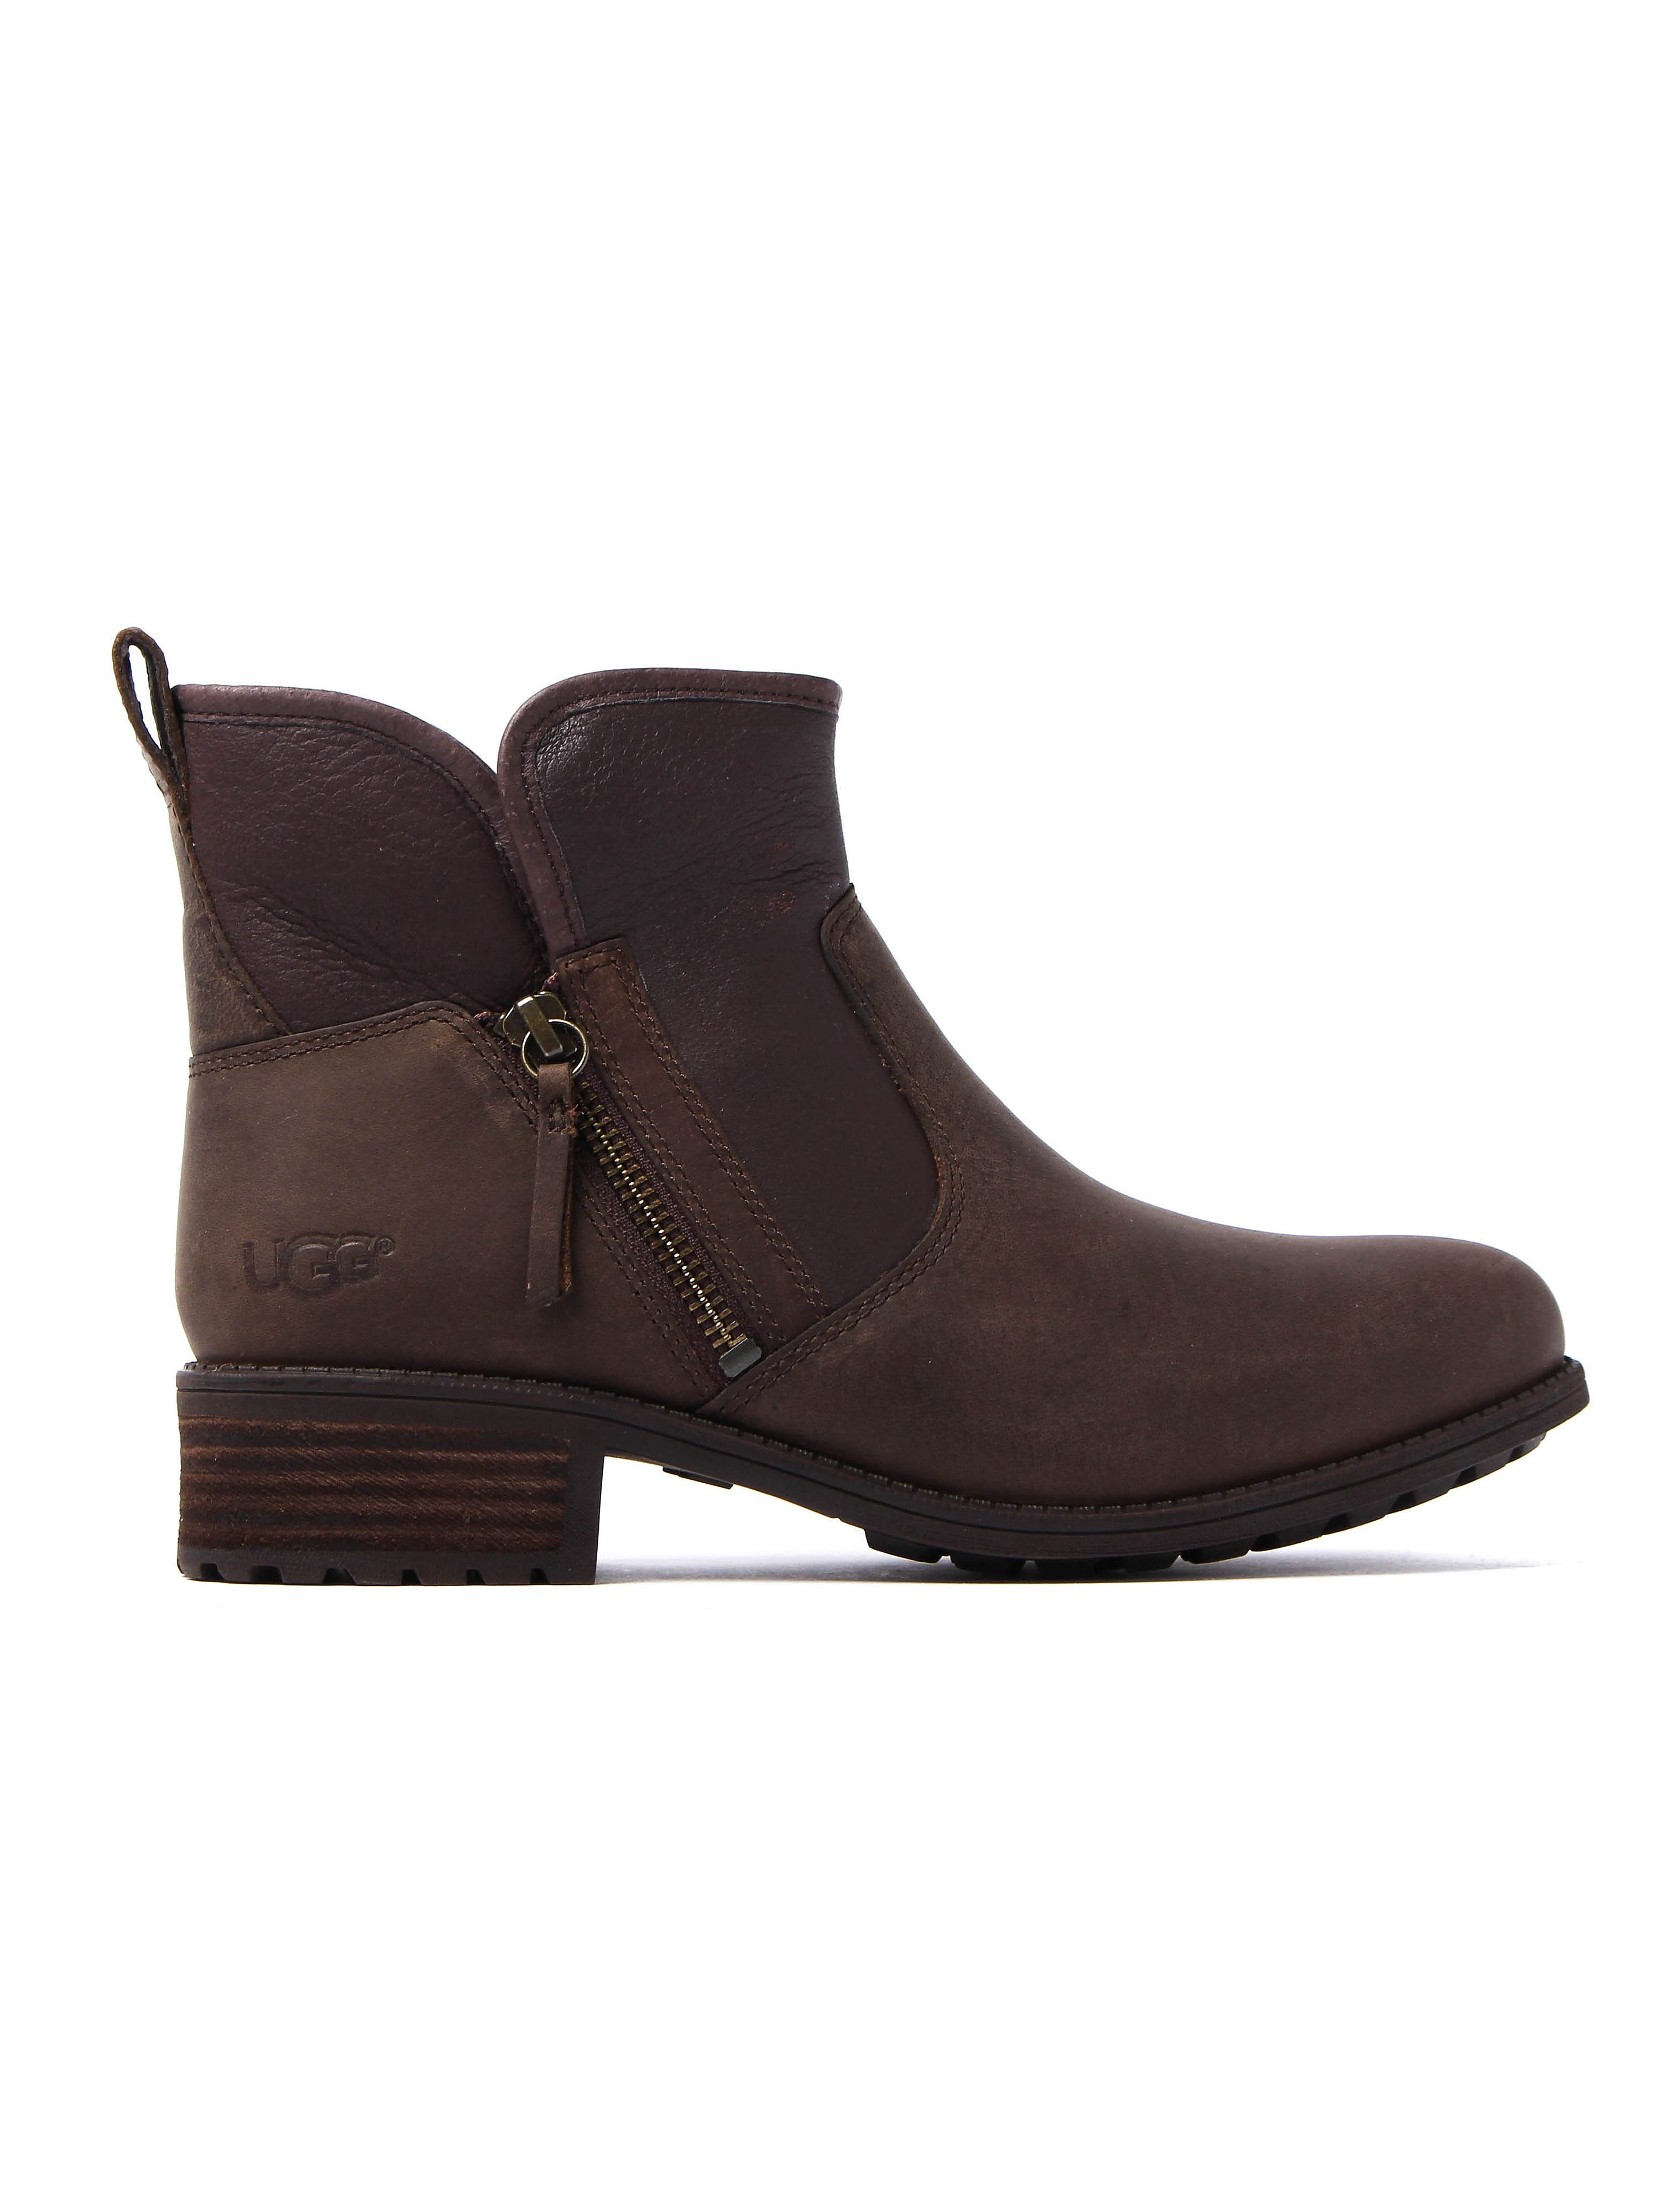 UGG Women's LaVelle Boots - Stout